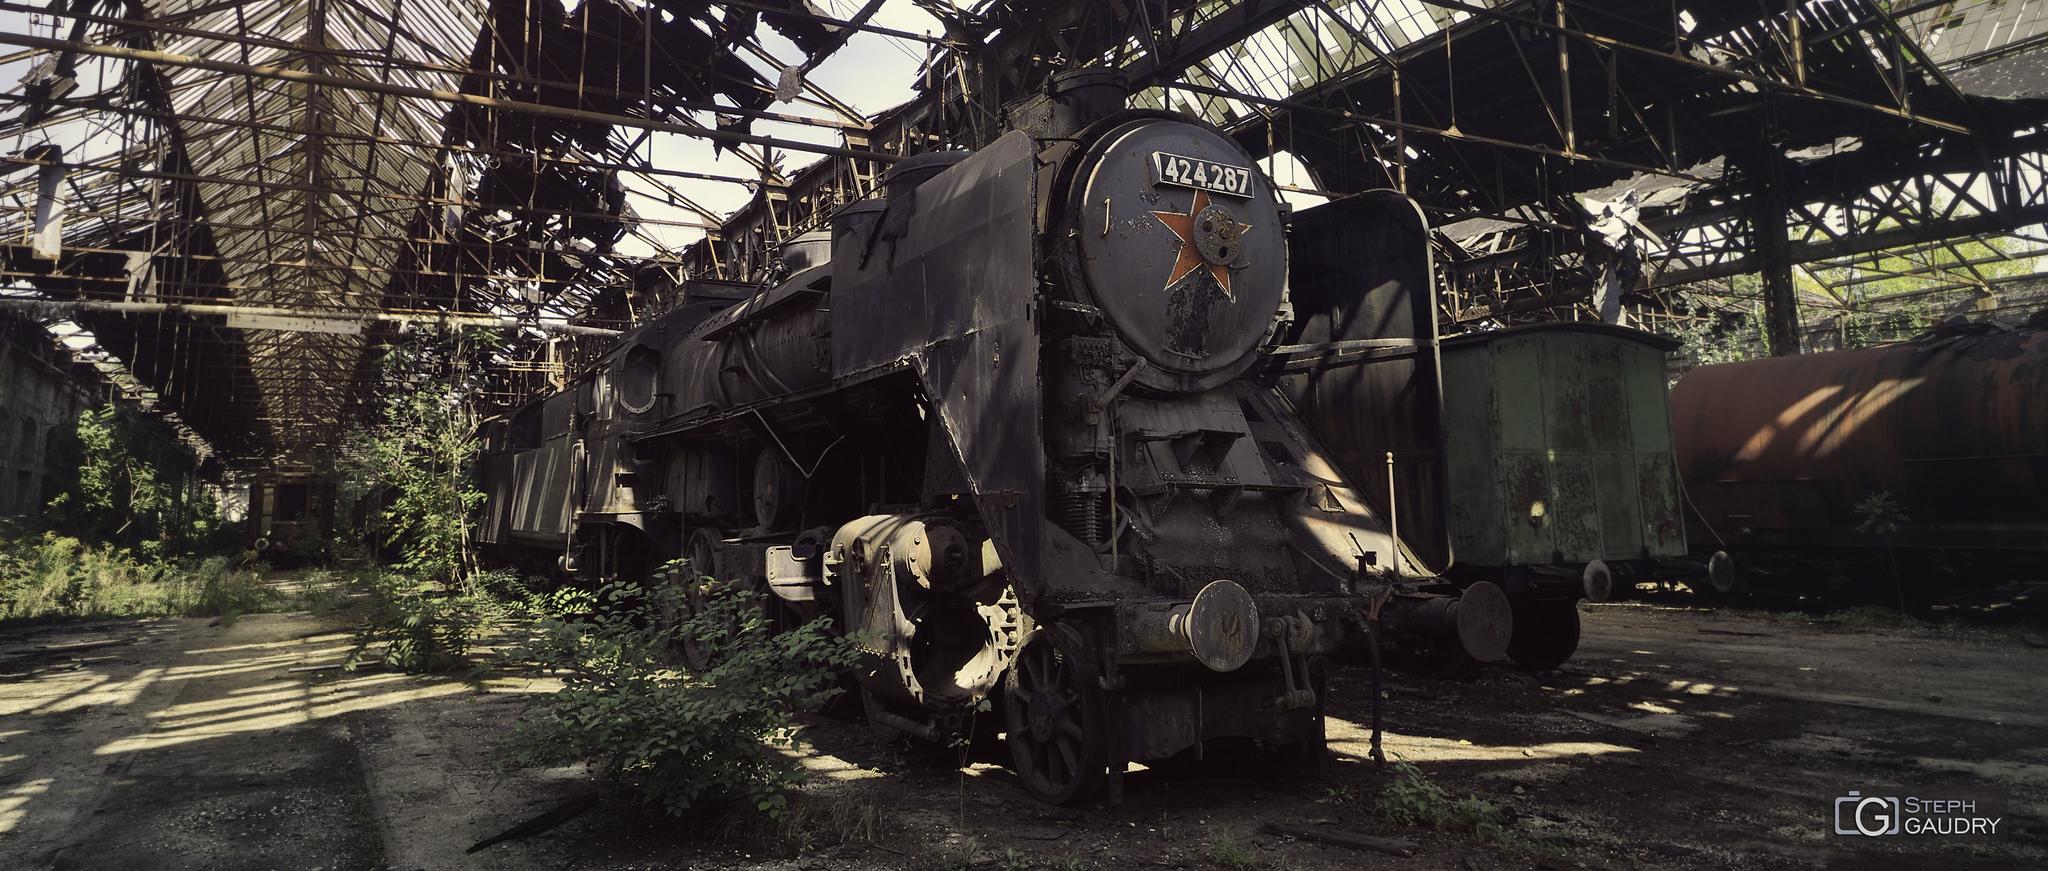 MÁV 424-287 (Abandoned Red star train) [Klik om de diavoorstelling te starten]